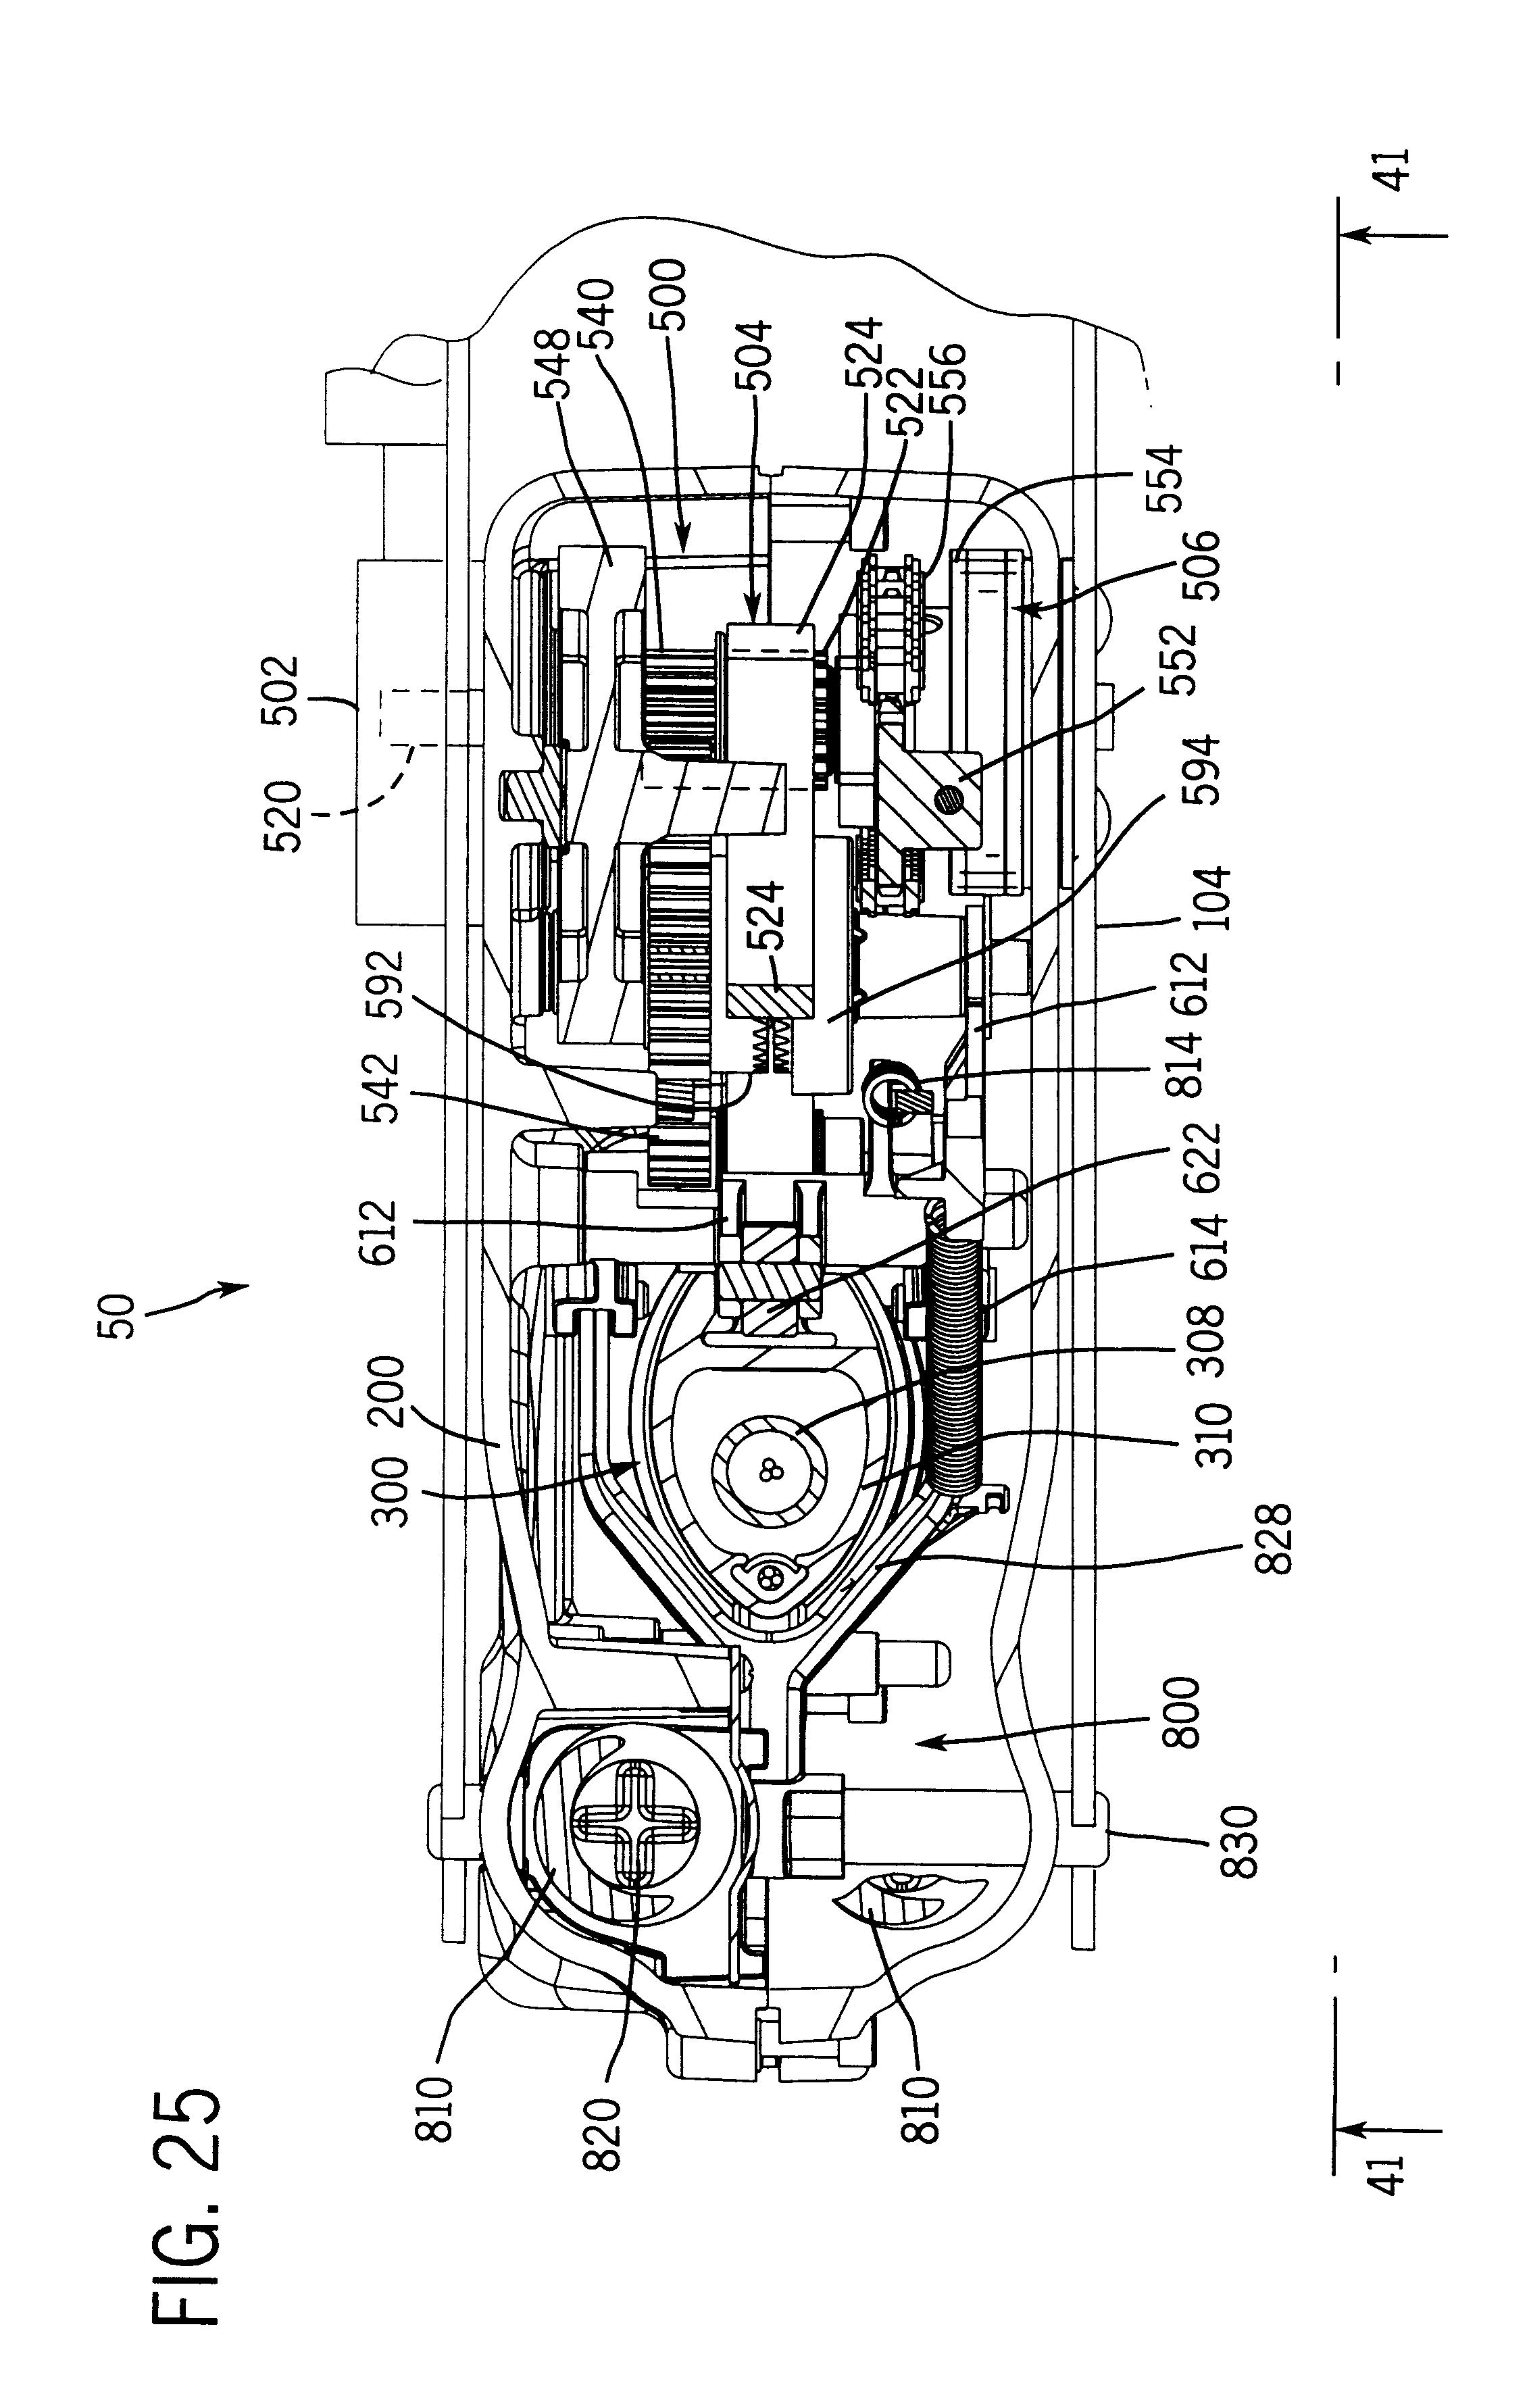 Trolling Motor Wiring Diagram 24 Furthermore 12 24 Volt Trolling Motor